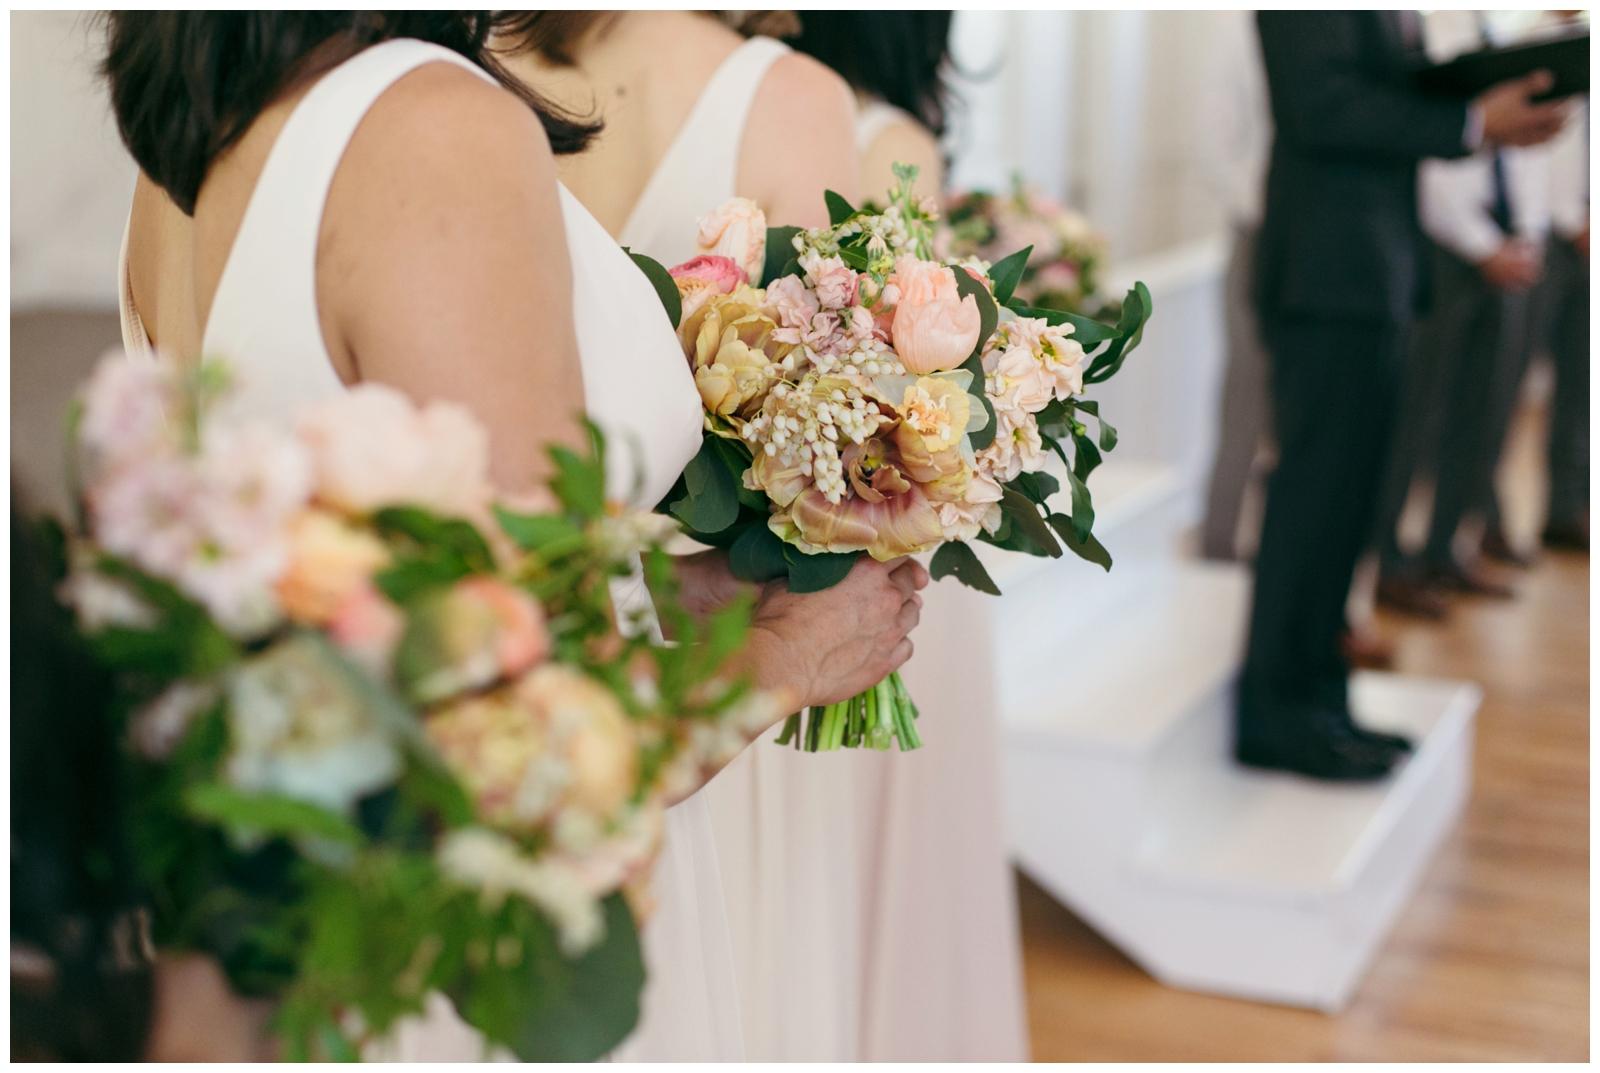 Samberg-Conference-Center-Boston-Wedding-Photographer-Bailey-Q-Photo-051.jpg